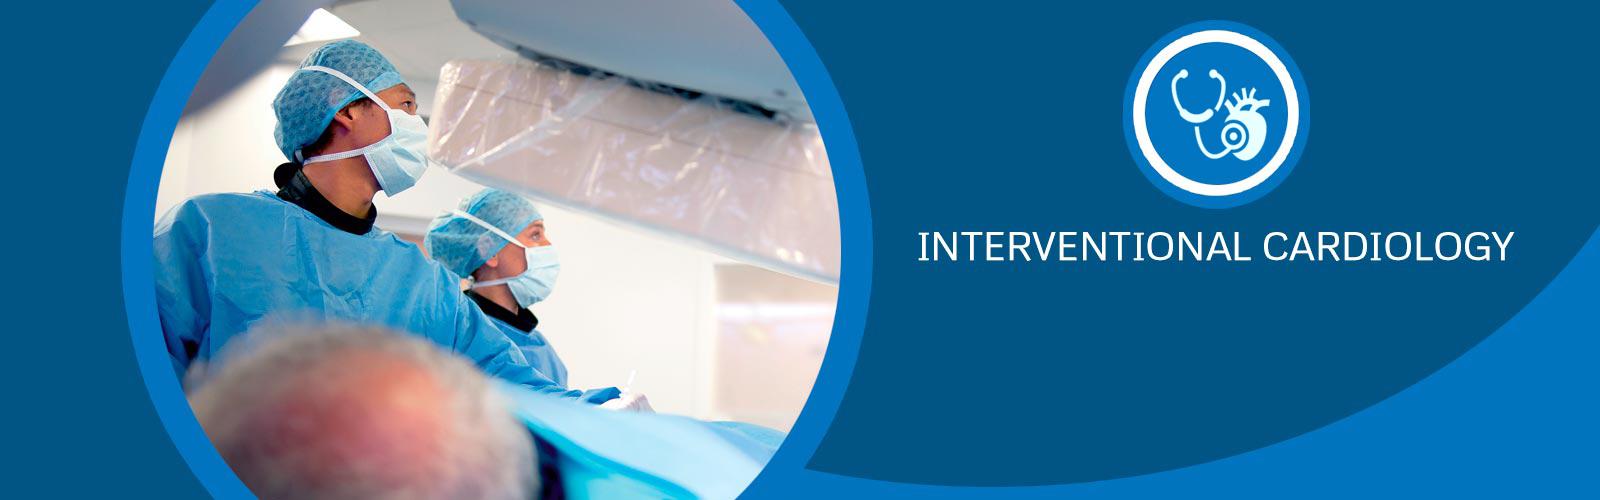 interventional-cardiology venkateshwar Hospital